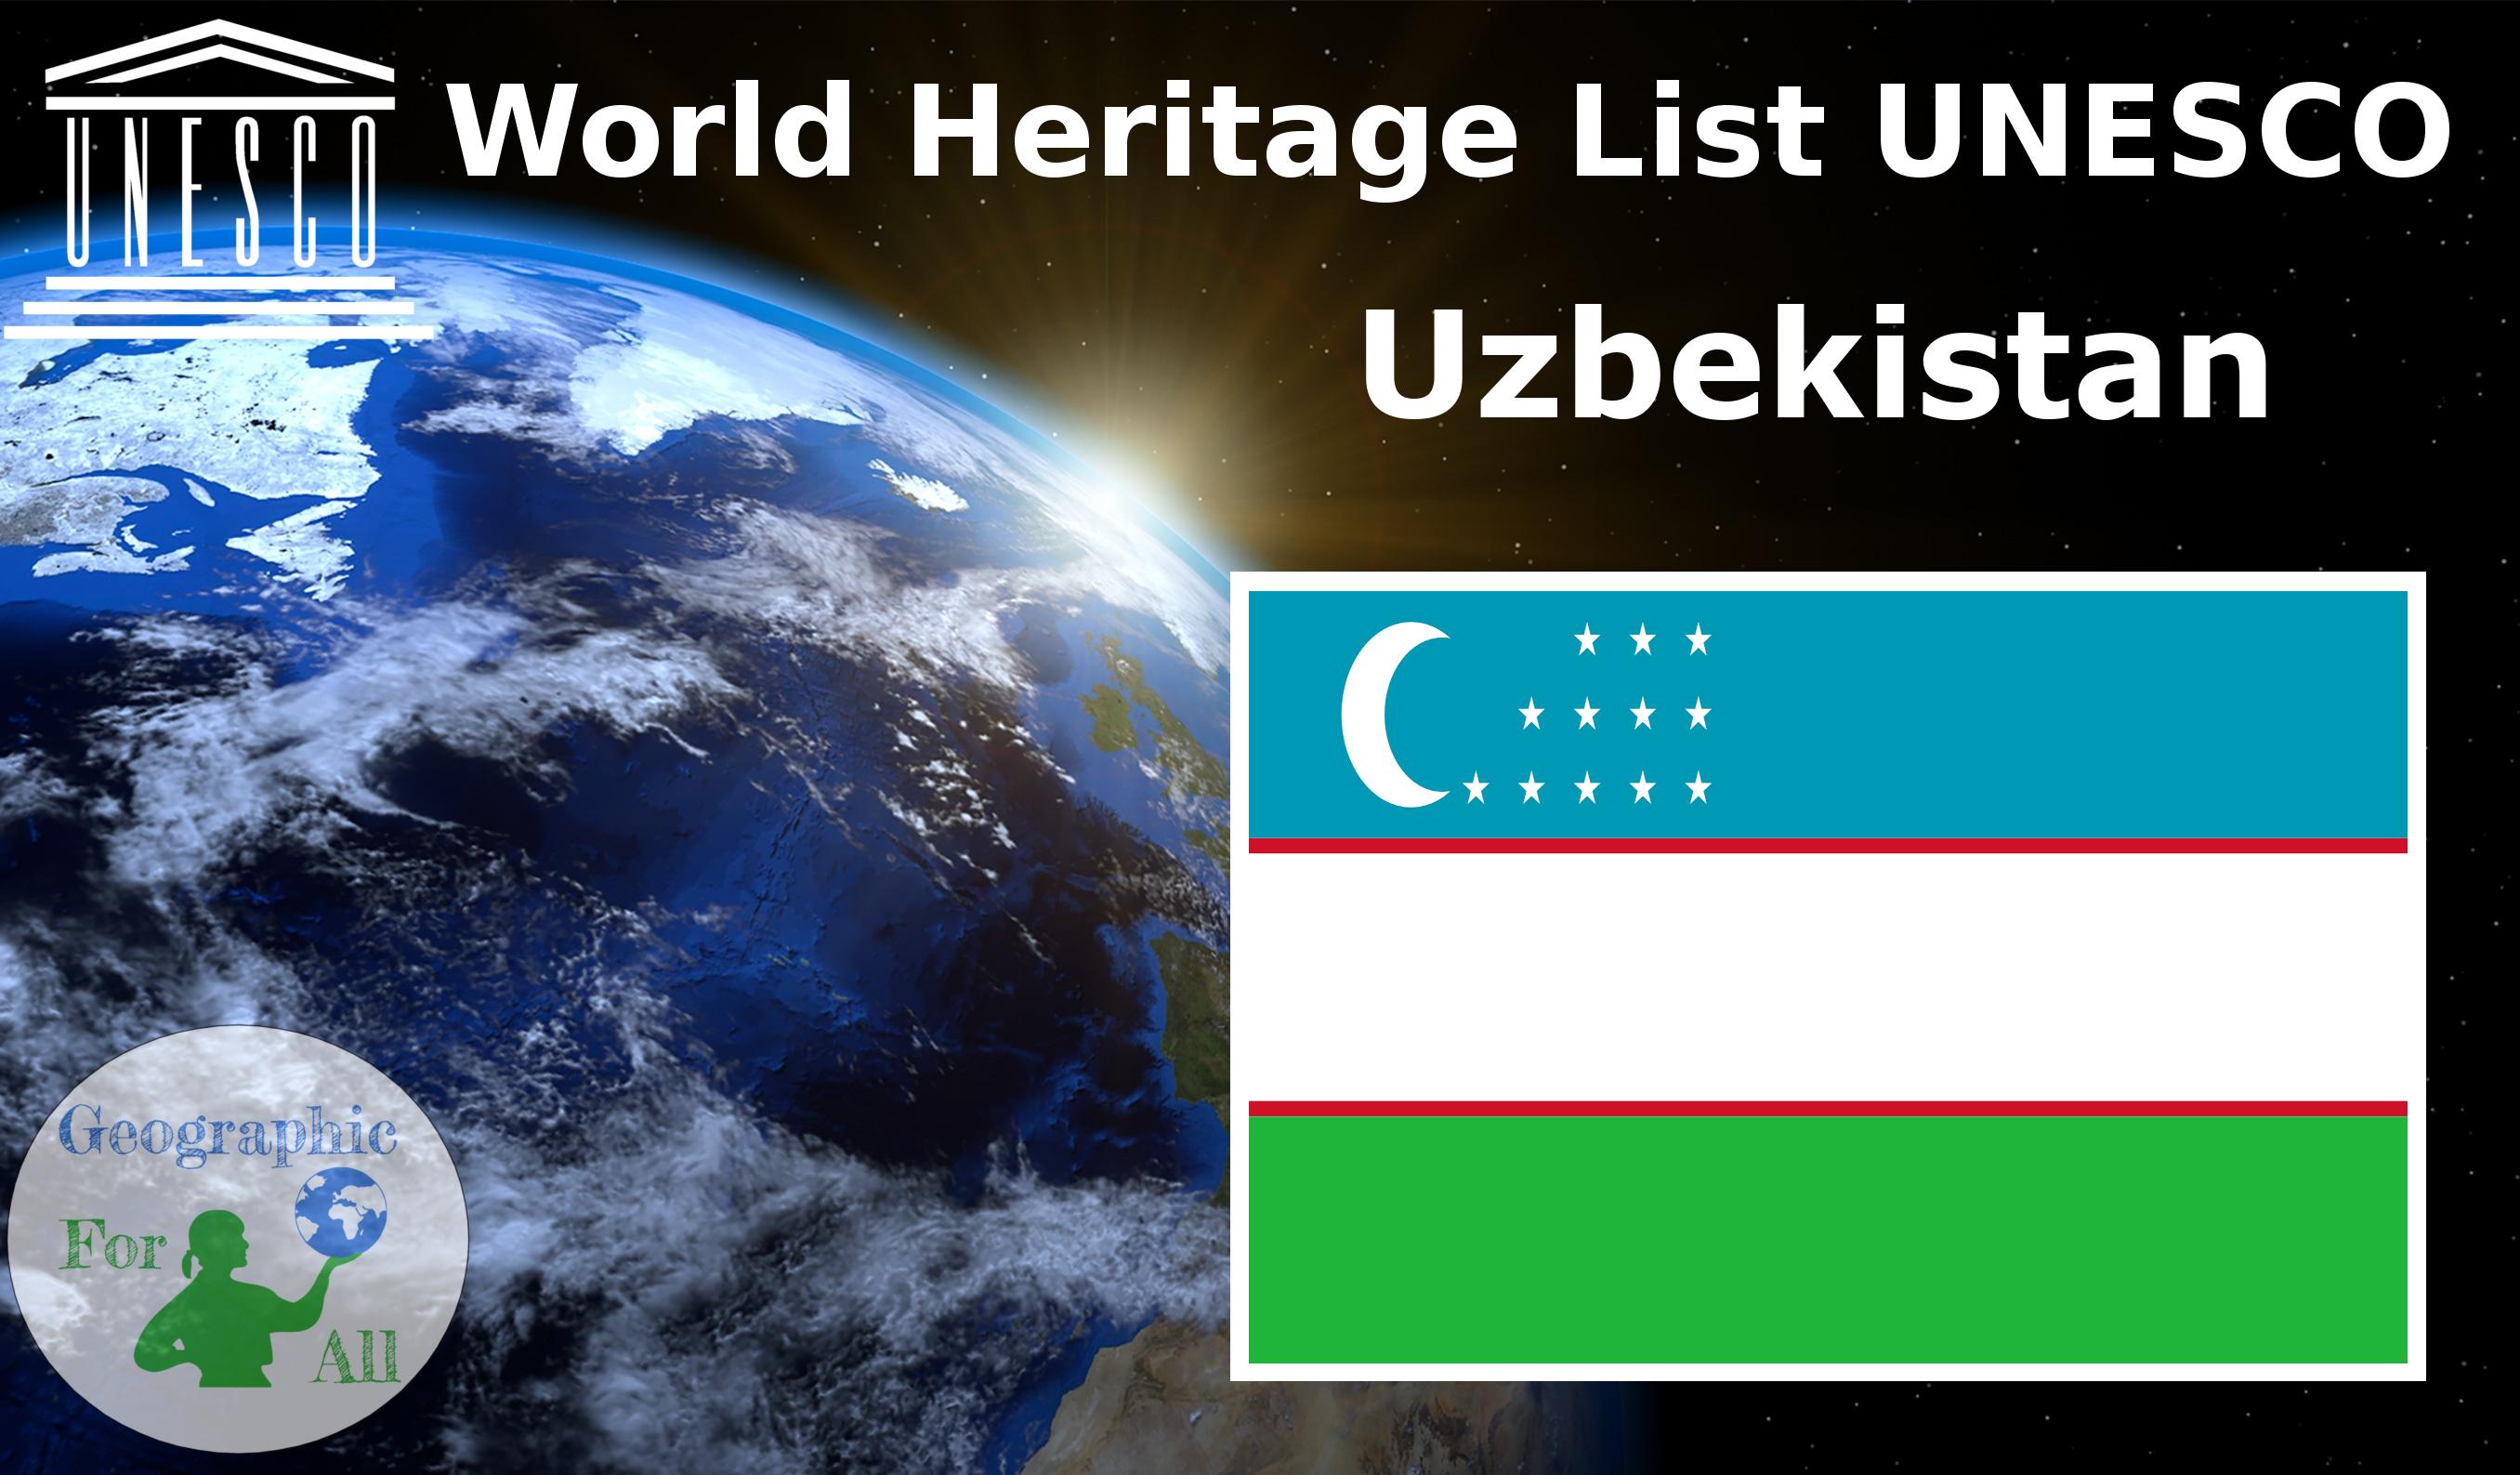 World Heritage List UNESCO - Uzbekistan